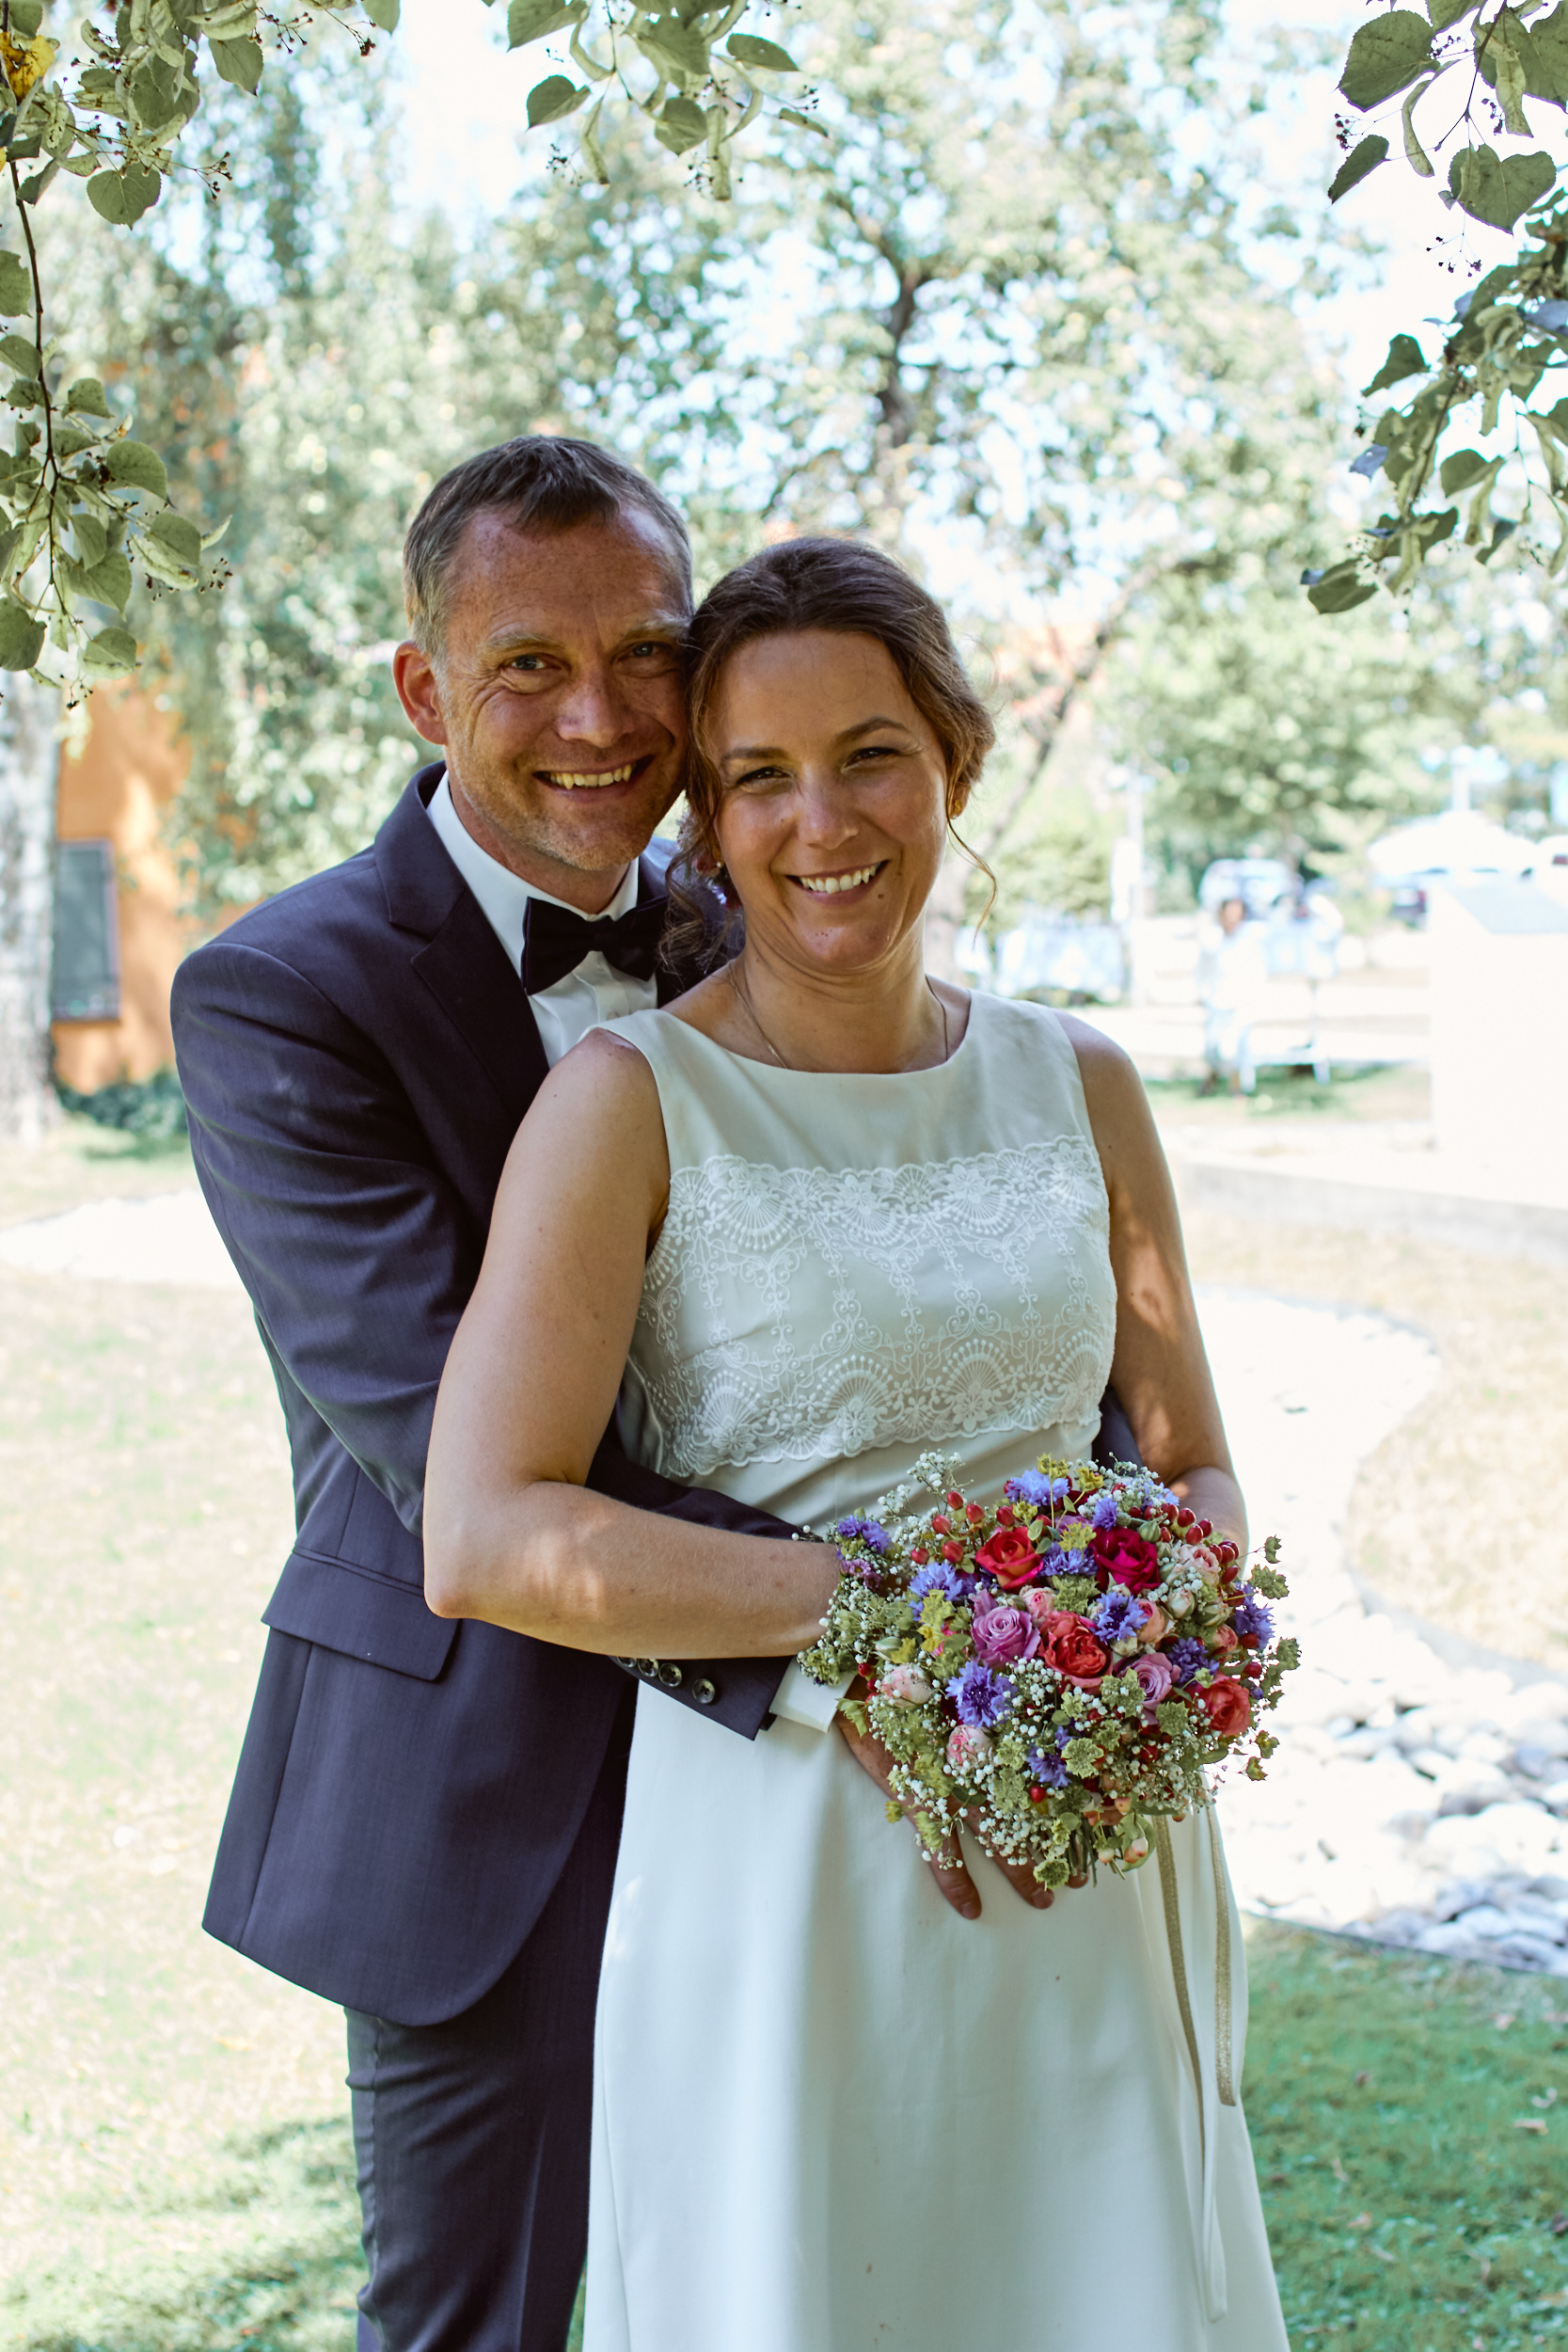 35 mm - 2018-07-27 13.40.58 - Hochzeit Andrea & Jochen Sektempfang.jpg